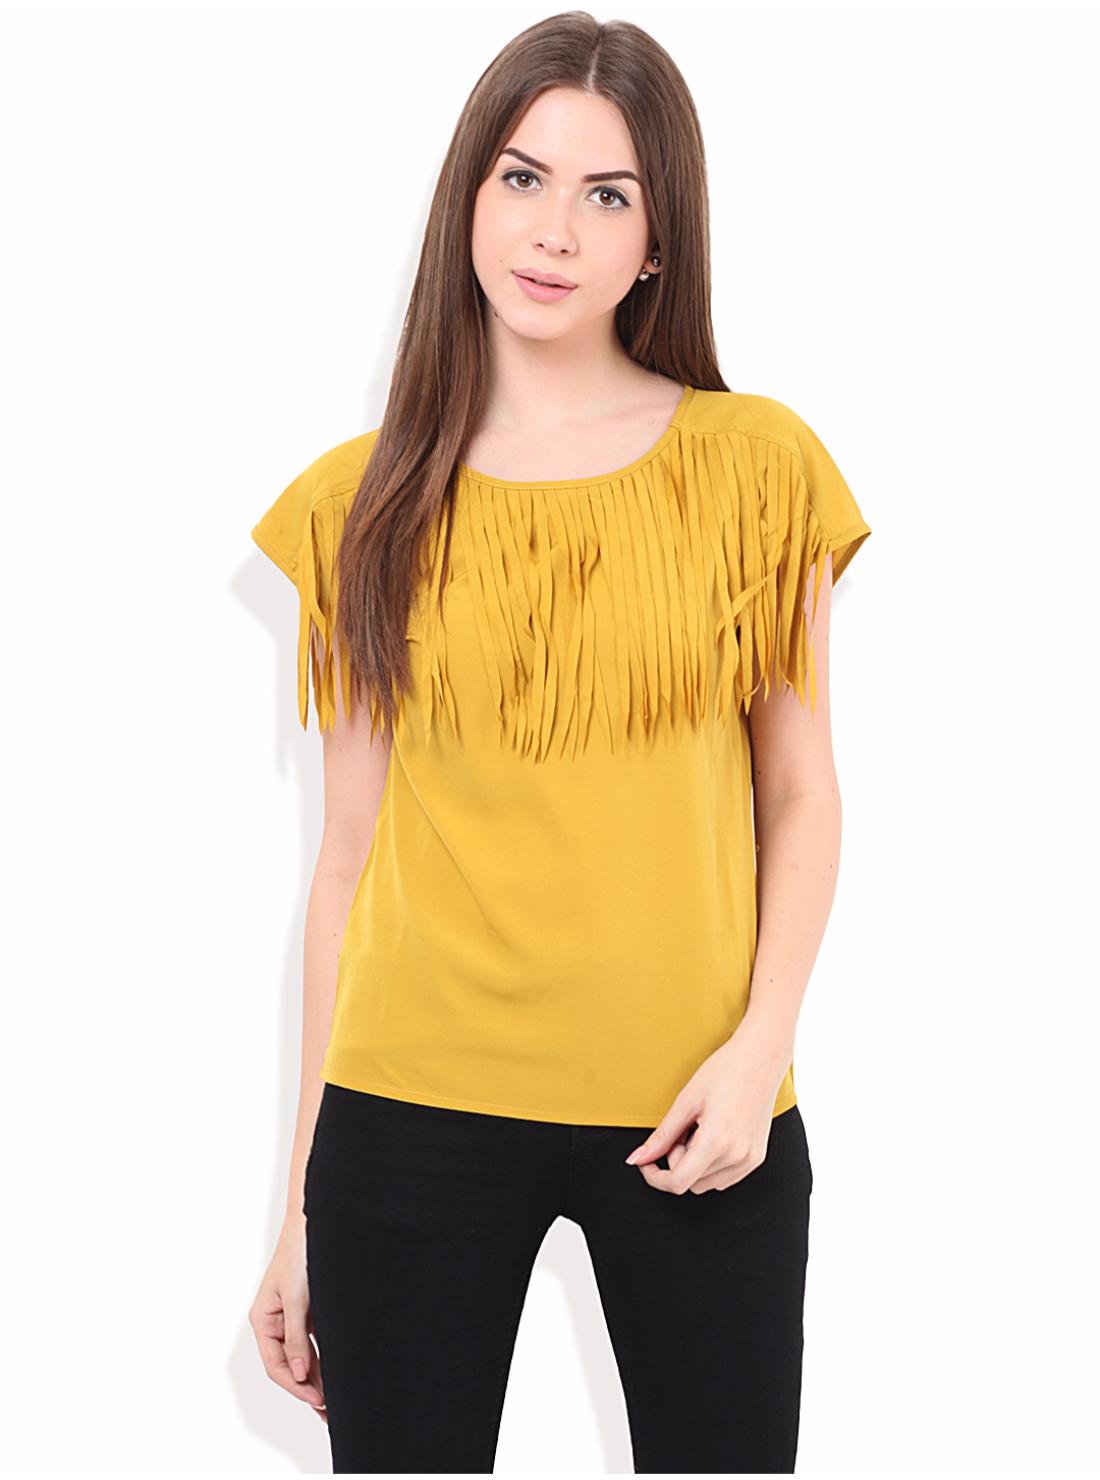 Porsorte   PORSORTE Women's  Polyester Solid Yellow Top